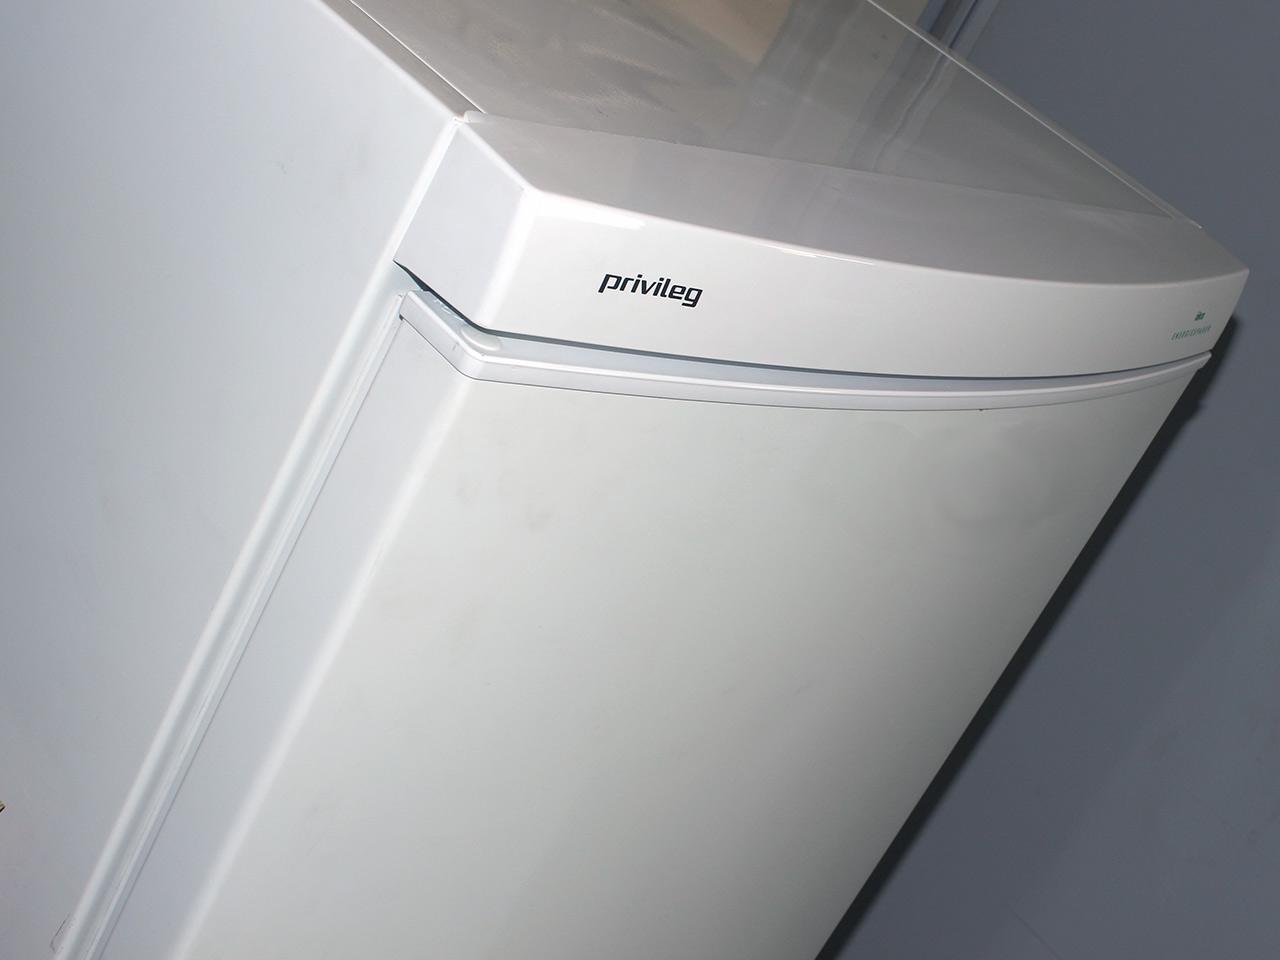 Großzügig Privileg Kühlschrank Retro Bilder - Das Beste ...